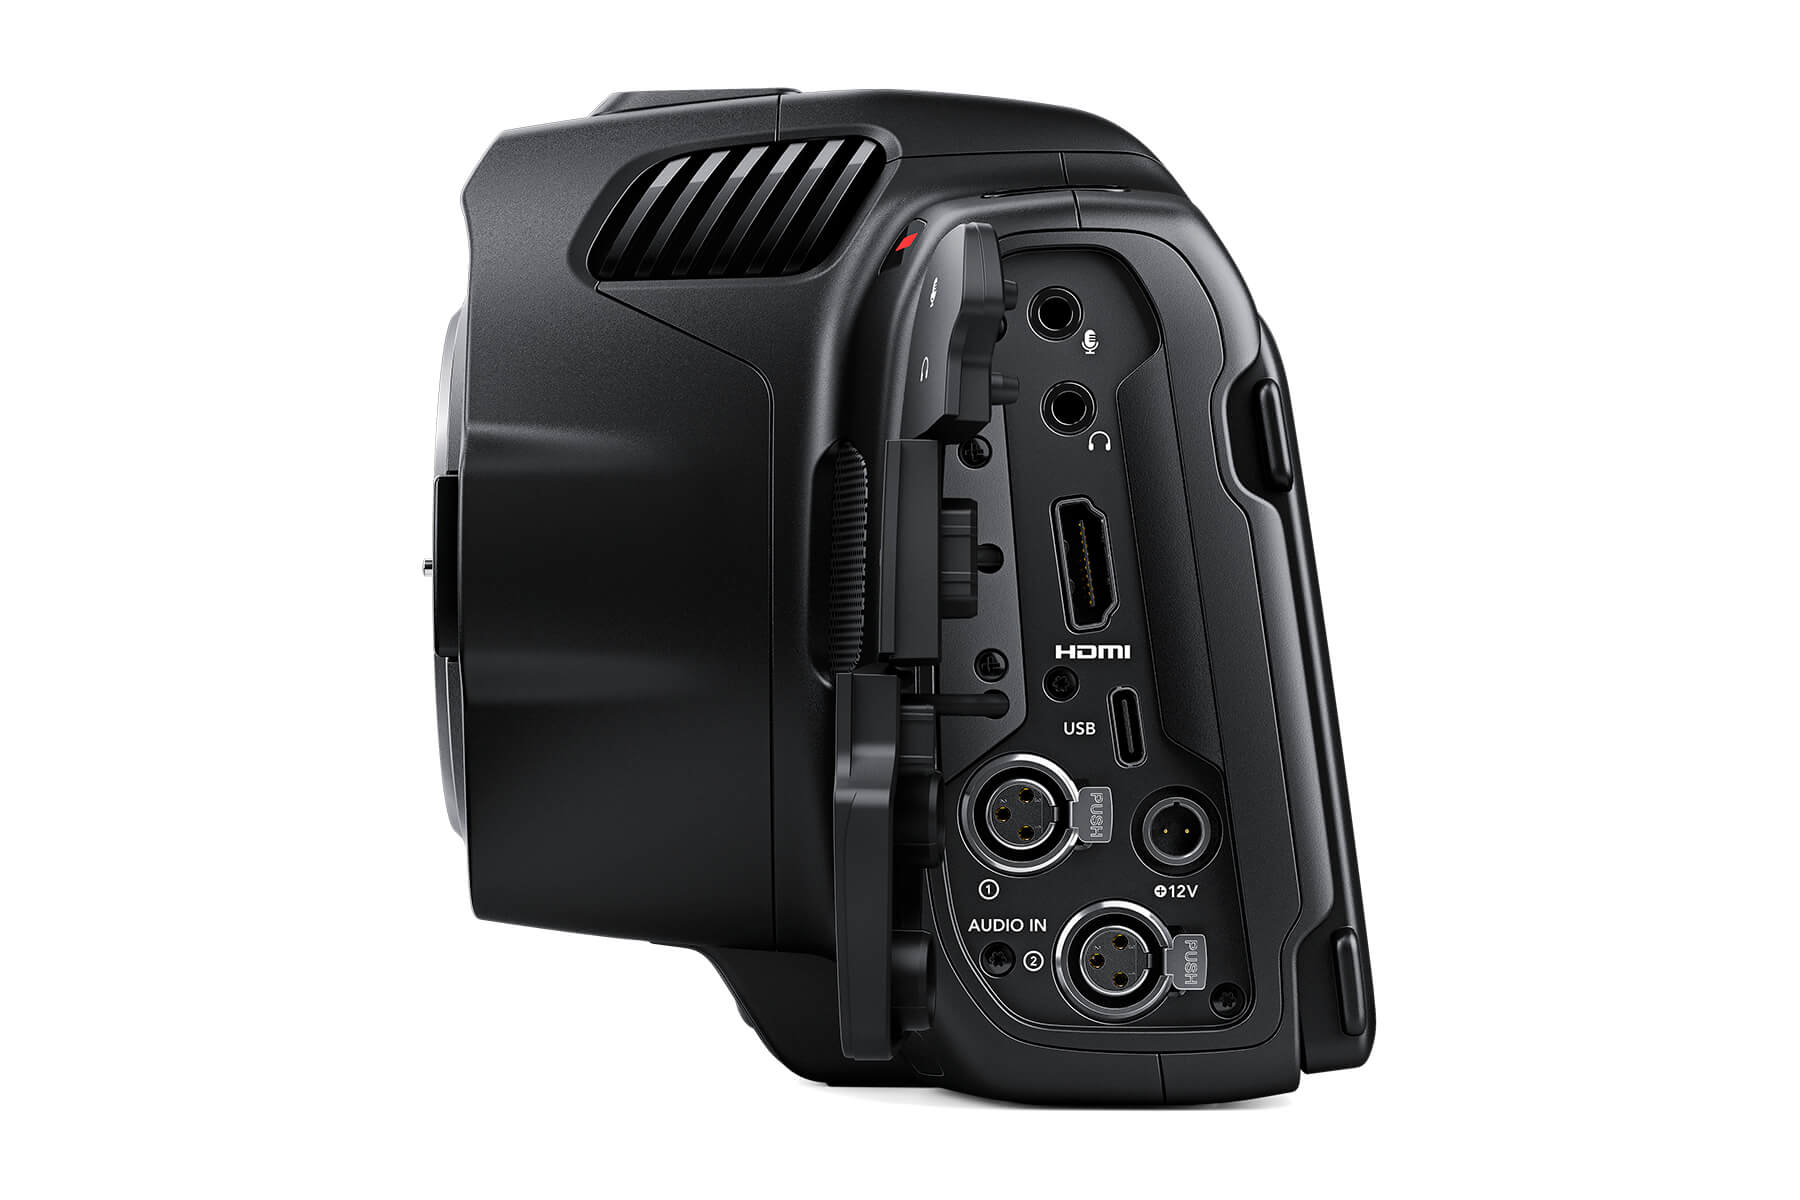 Blackmagic Pocket Cinema Camera 6K Pro connectivity